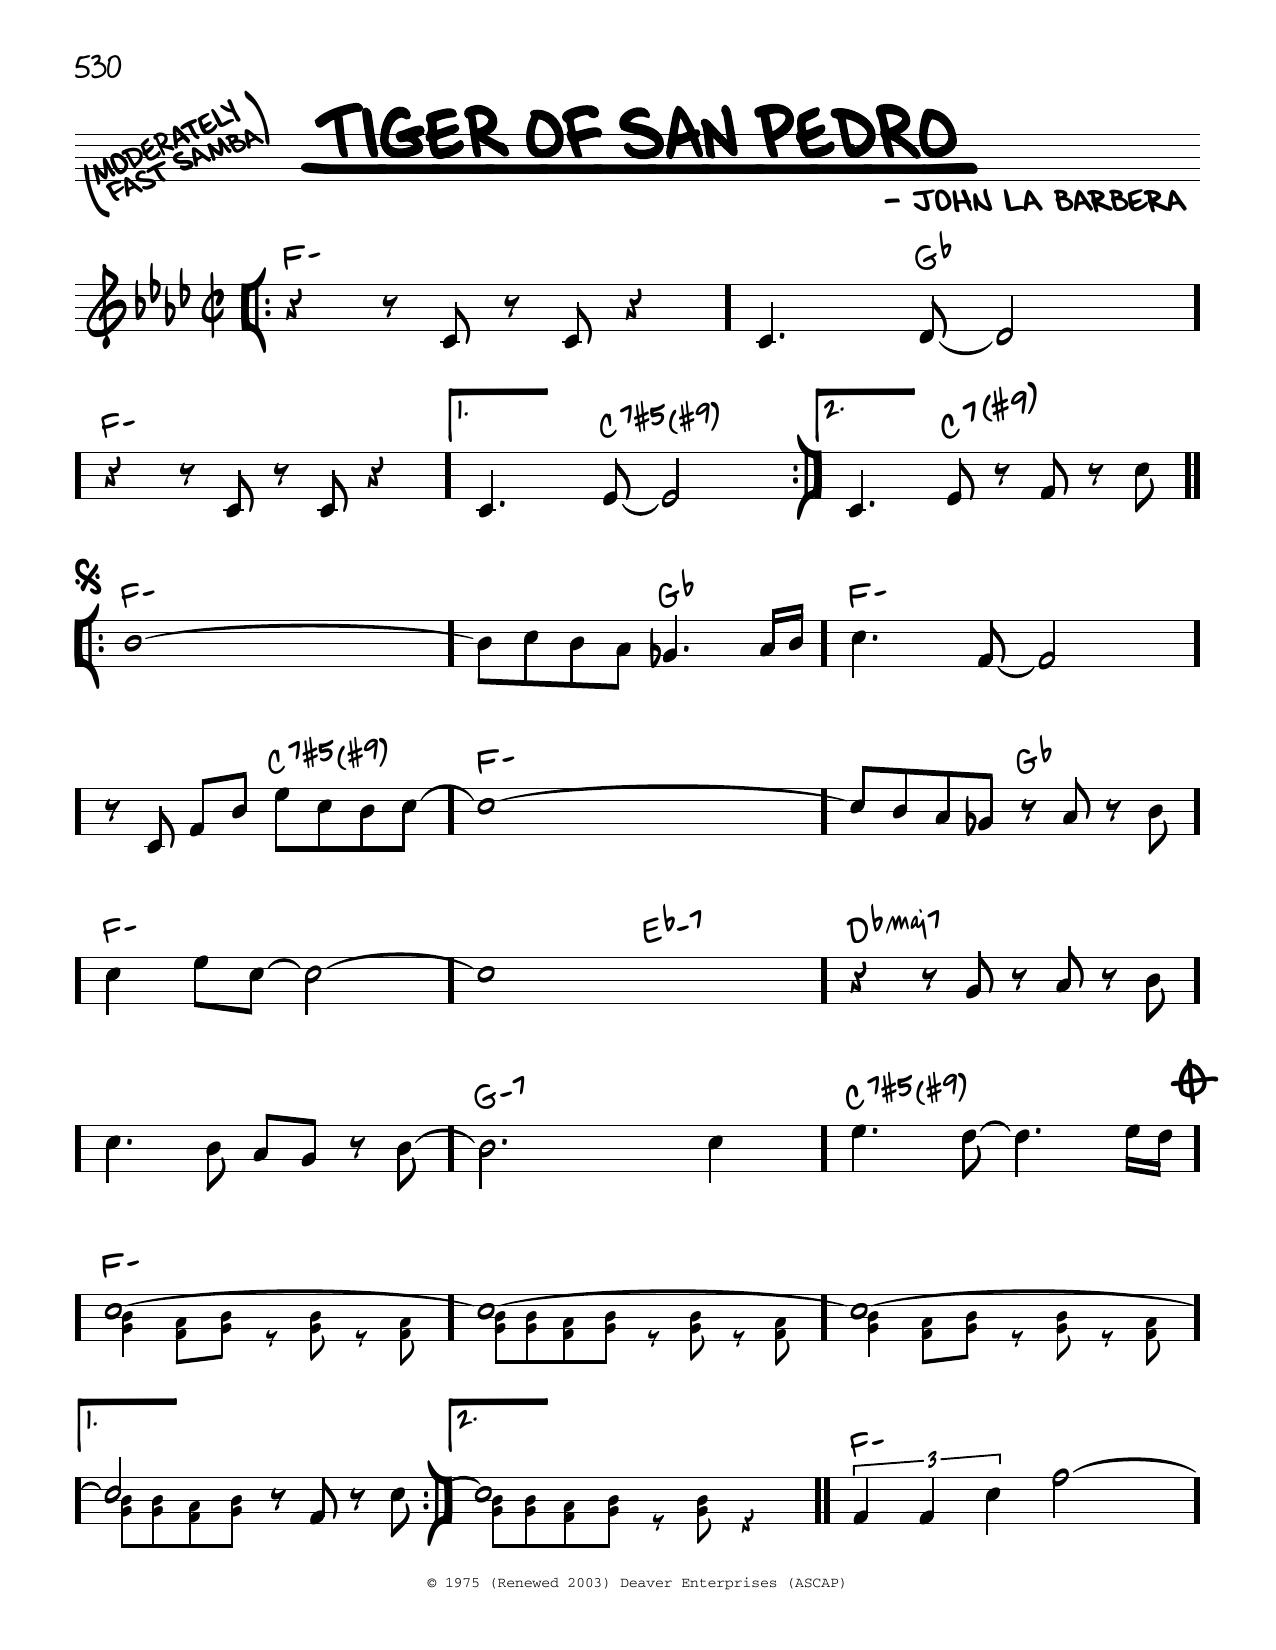 John La Barbera Tiger Of San Pedro sheet music notes and chords. Download Printable PDF.